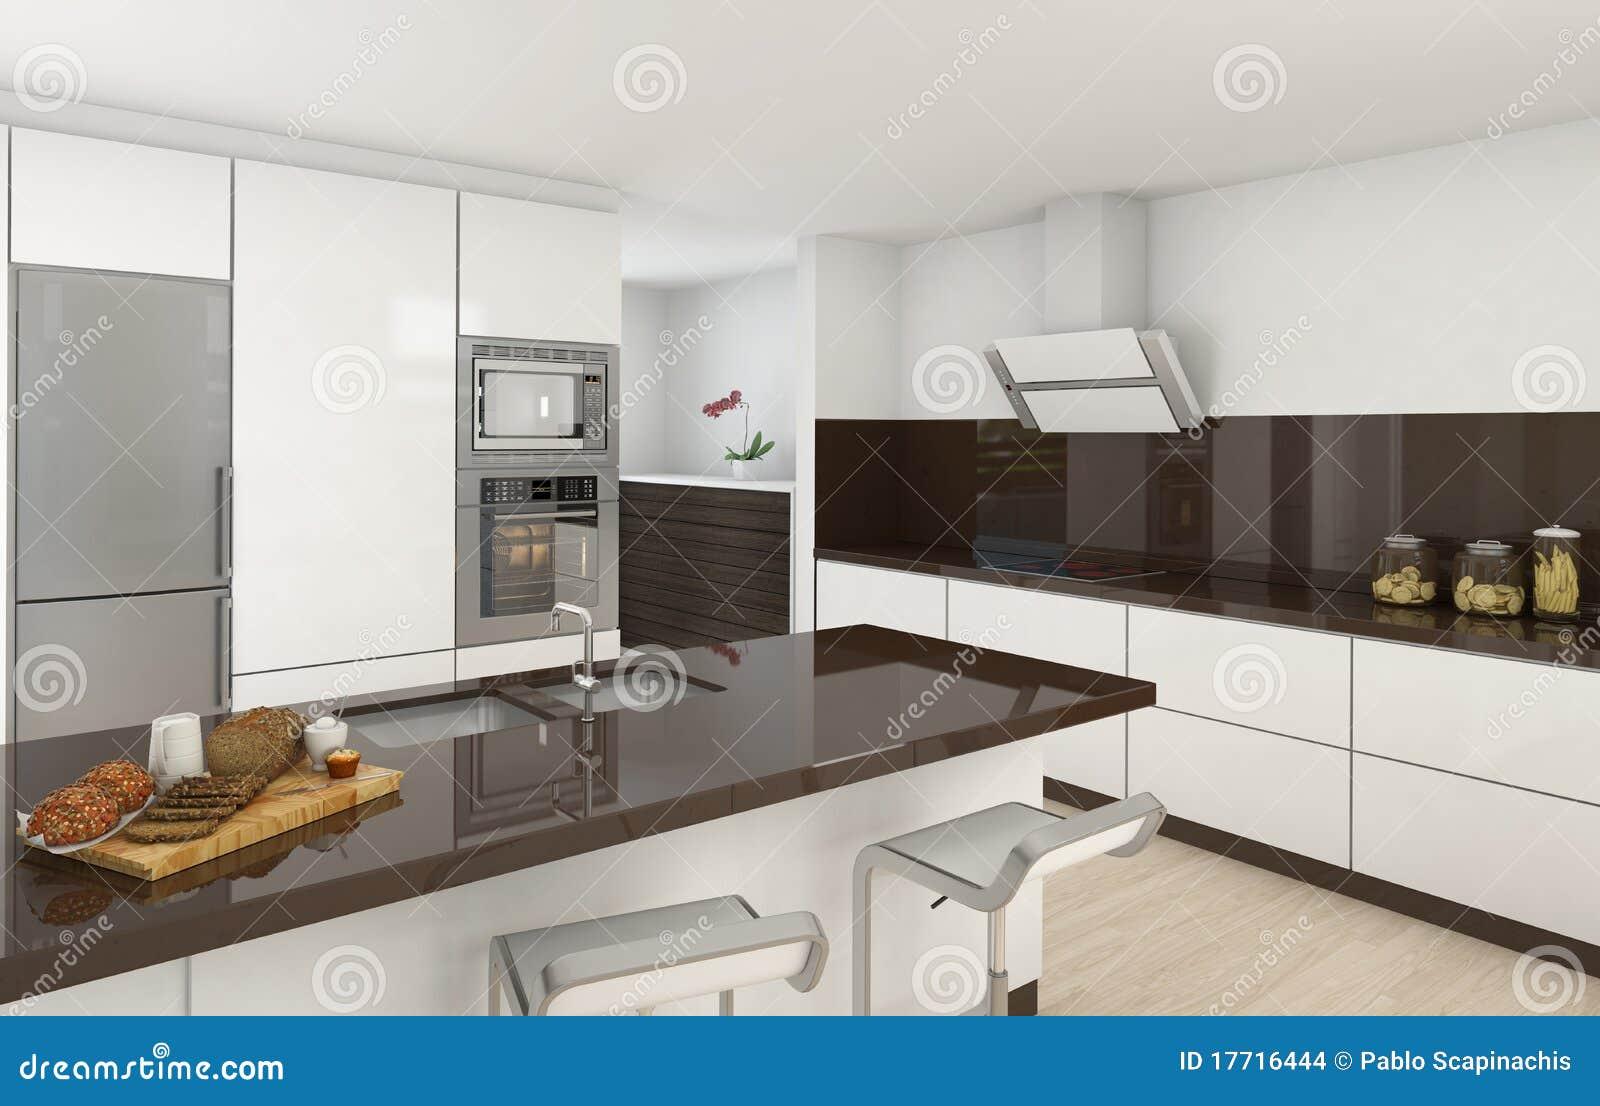 Cucina moderna bianca e marrone immagini stock immagine - Cucina bianca e marrone ...